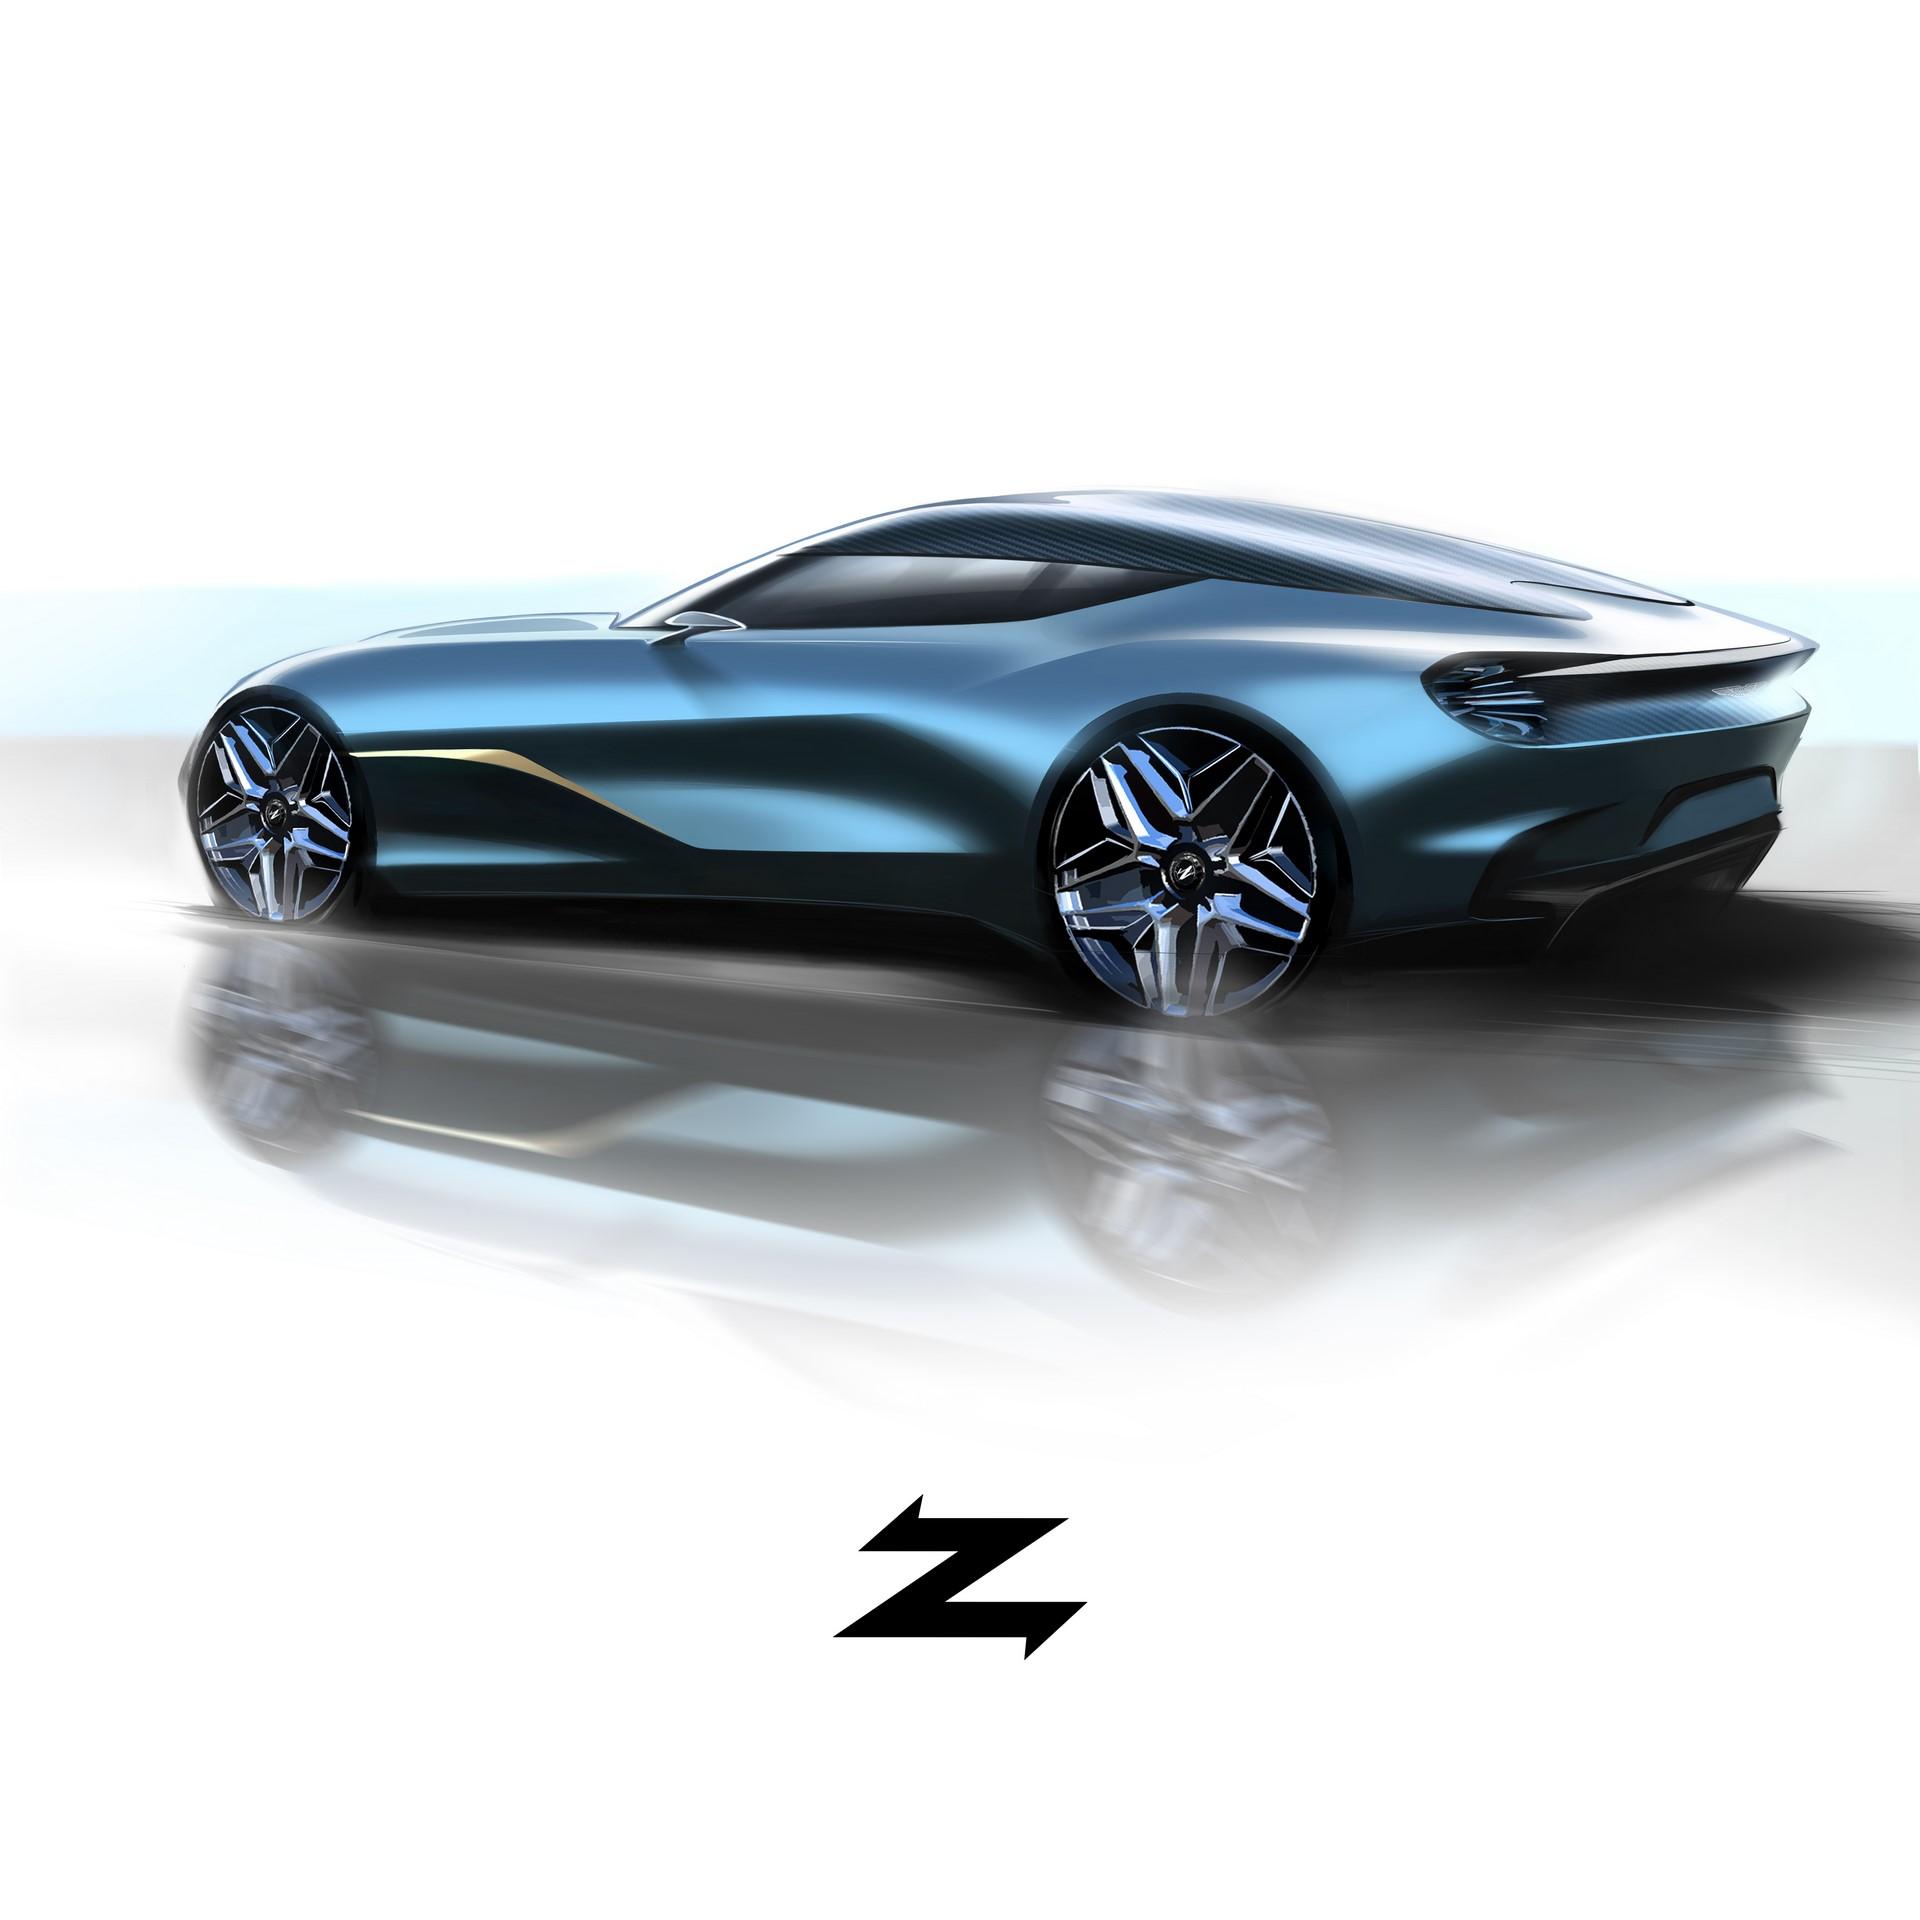 DBS GT Zagato_02